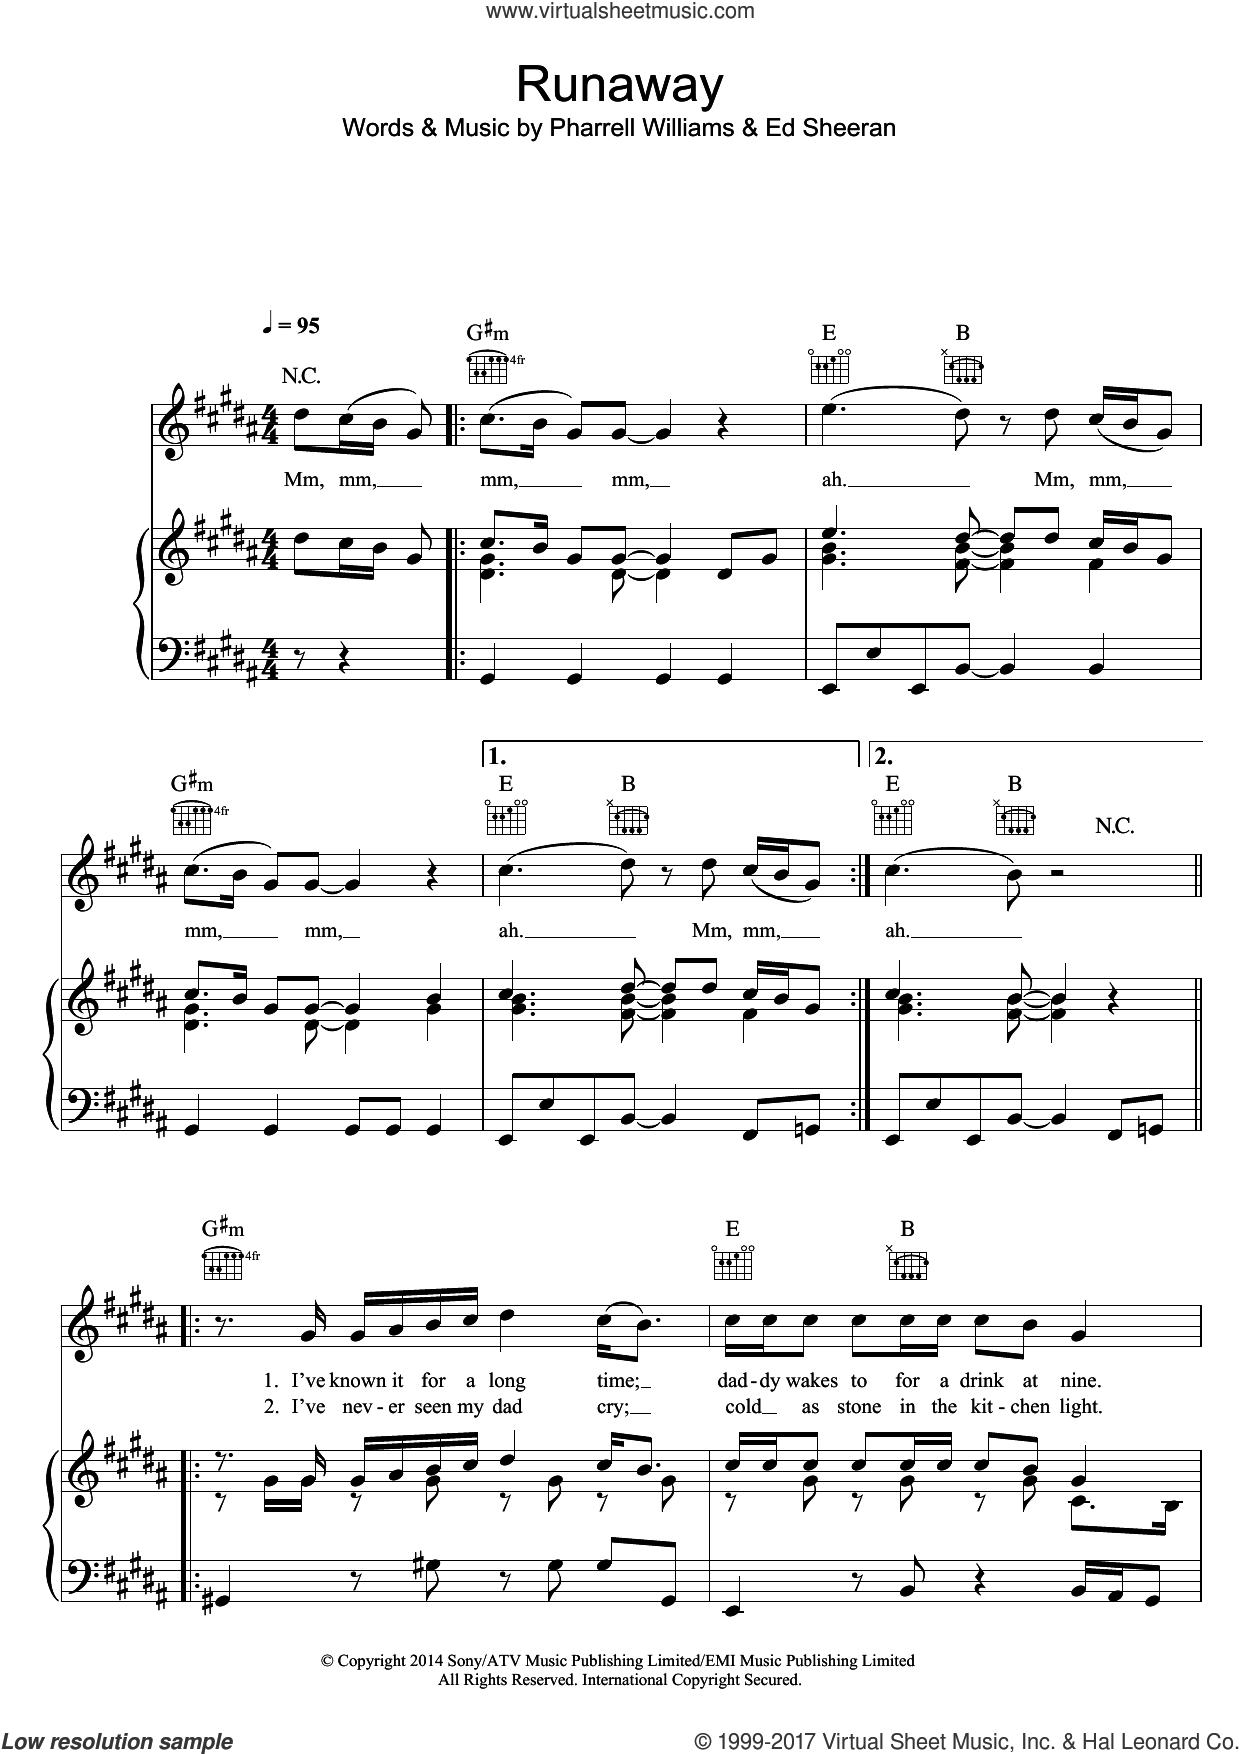 Runaway sheet music for voice, piano or guitar by Ed Sheeran and Pharrell Williams, intermediate skill level